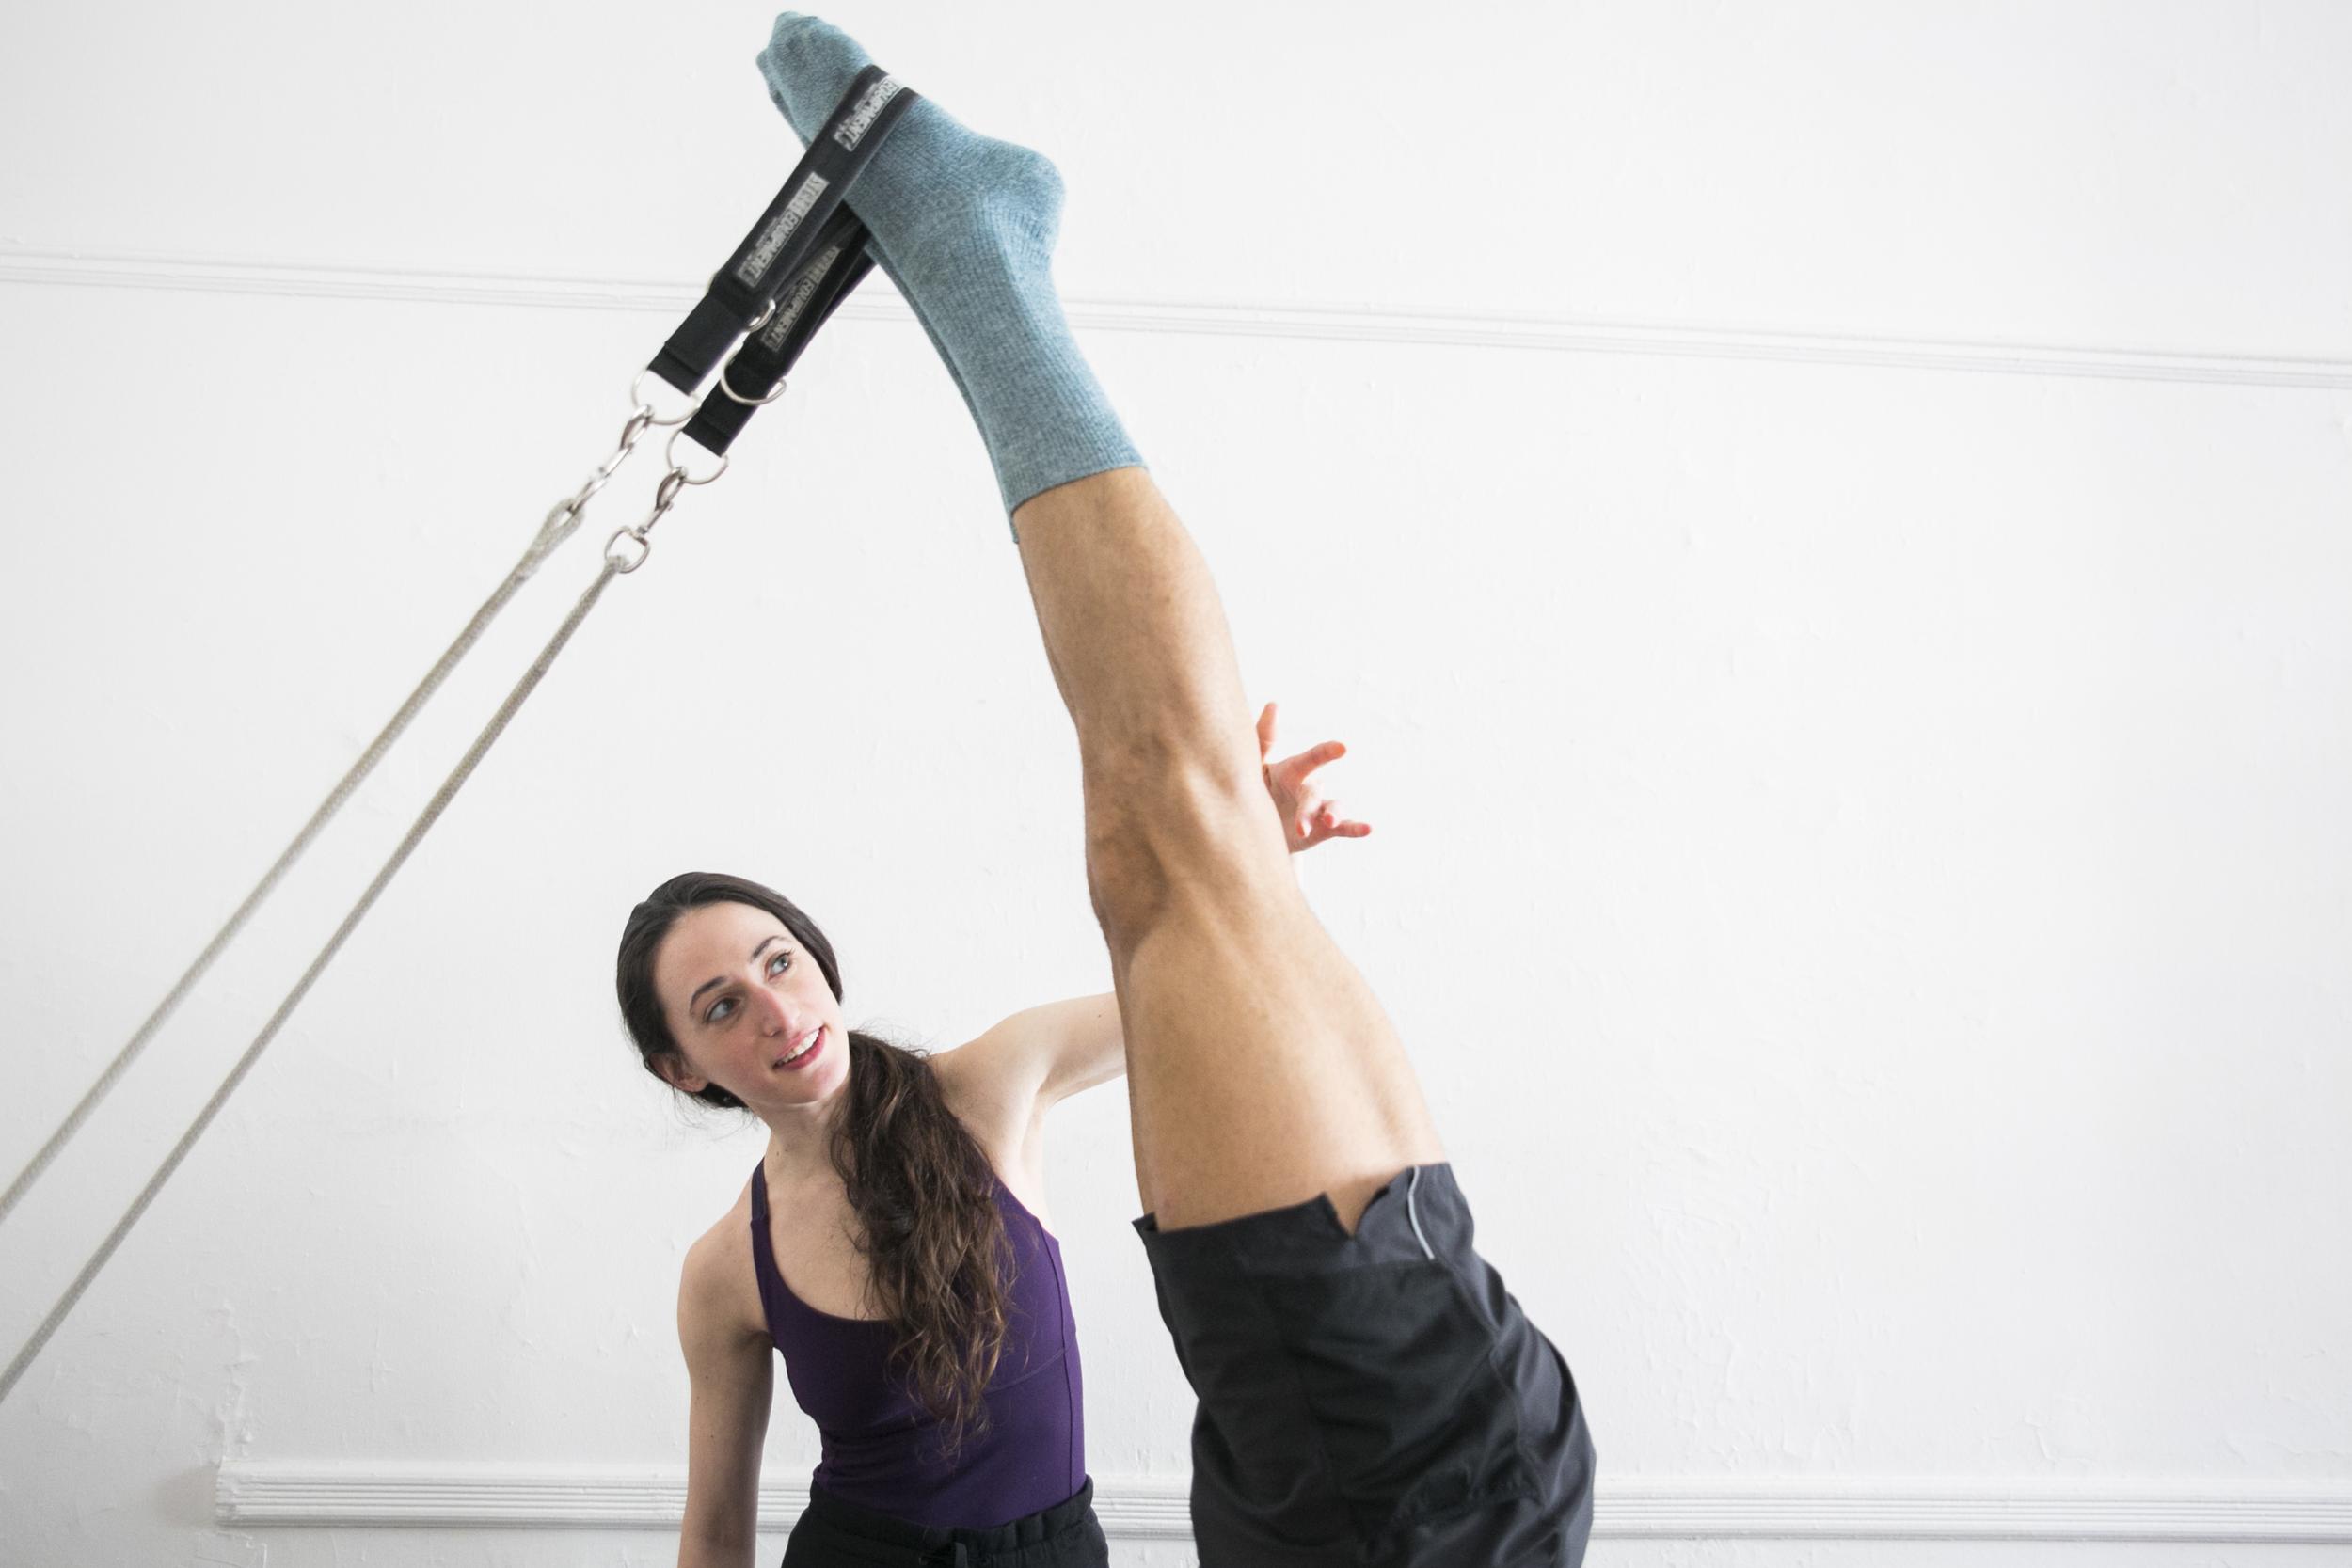 150325_DanielleRusso_Pilates_WhitneyBrowne-11.jpg